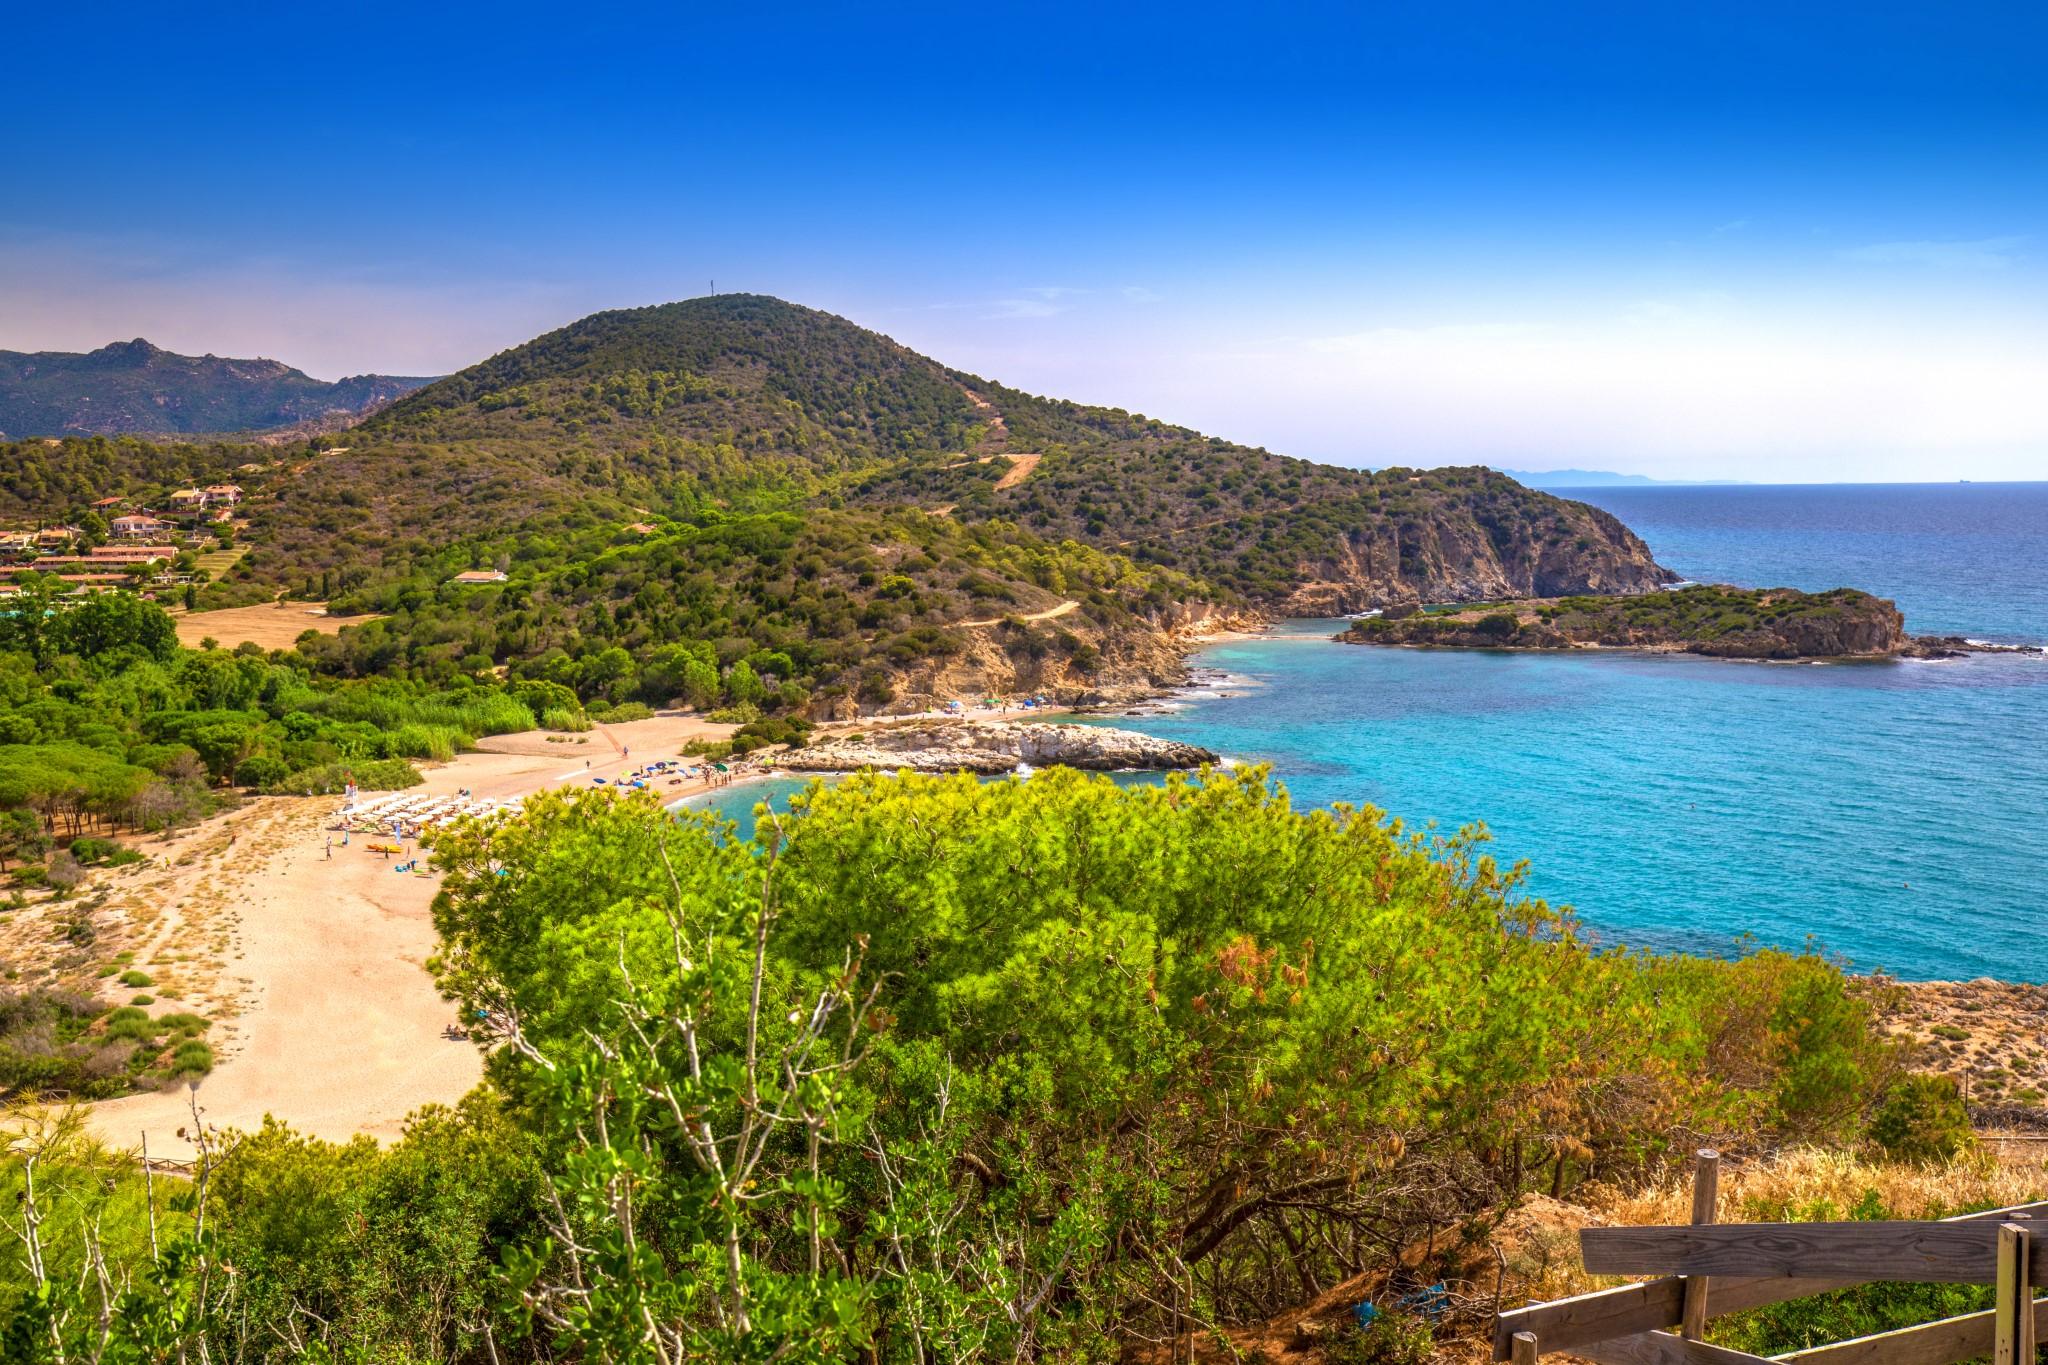 Su Portu beach near Spaggia di Chia Sa Colonia and famous Chia beach, Sardinia, Italy, Europe. Sardinia is the second largest island in the Mediterranean Sea